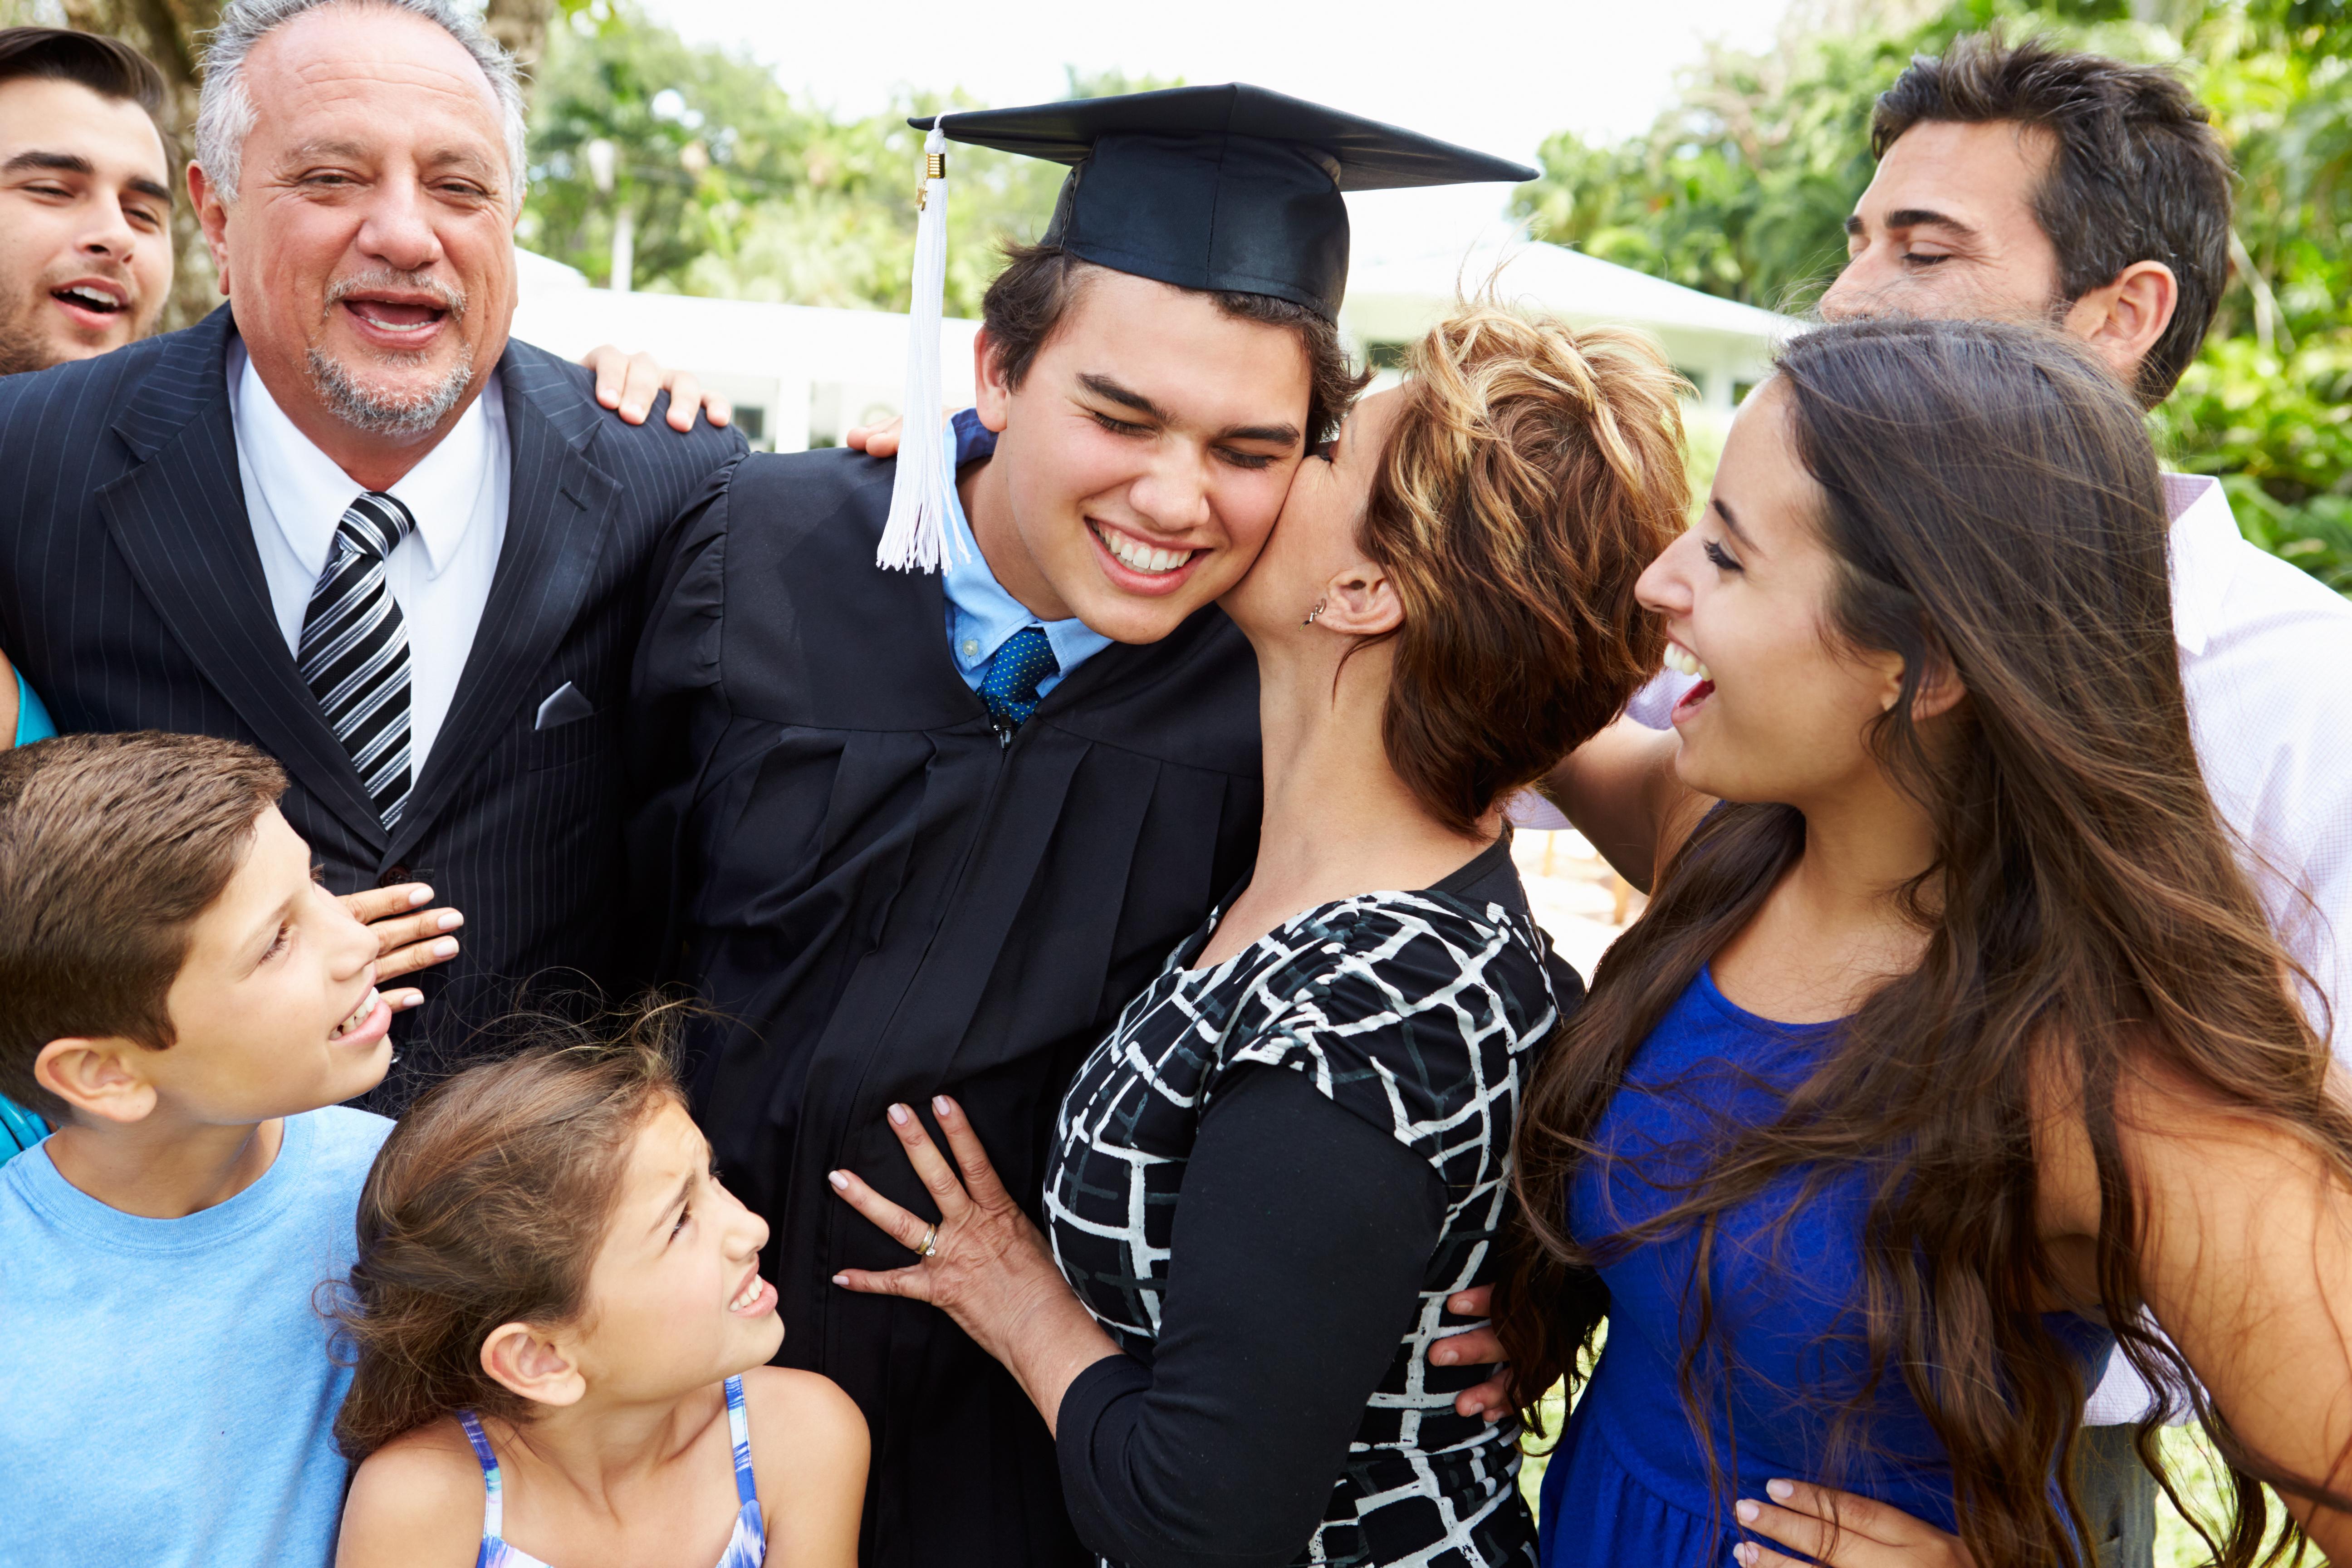 Hispanic family celebrating graduation with teenage high school graduate